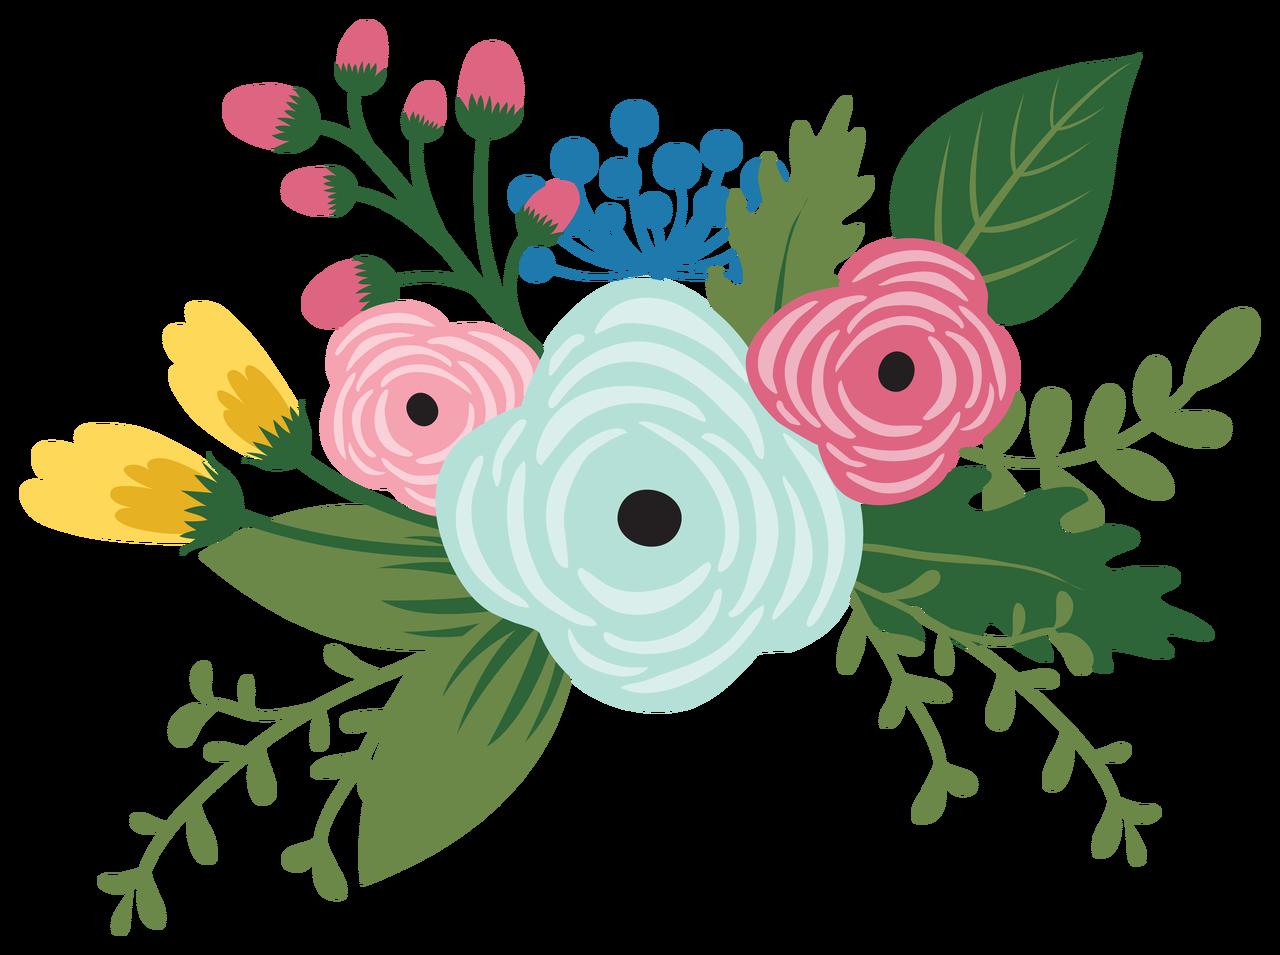 Have Faith Flowers Print & Cut File